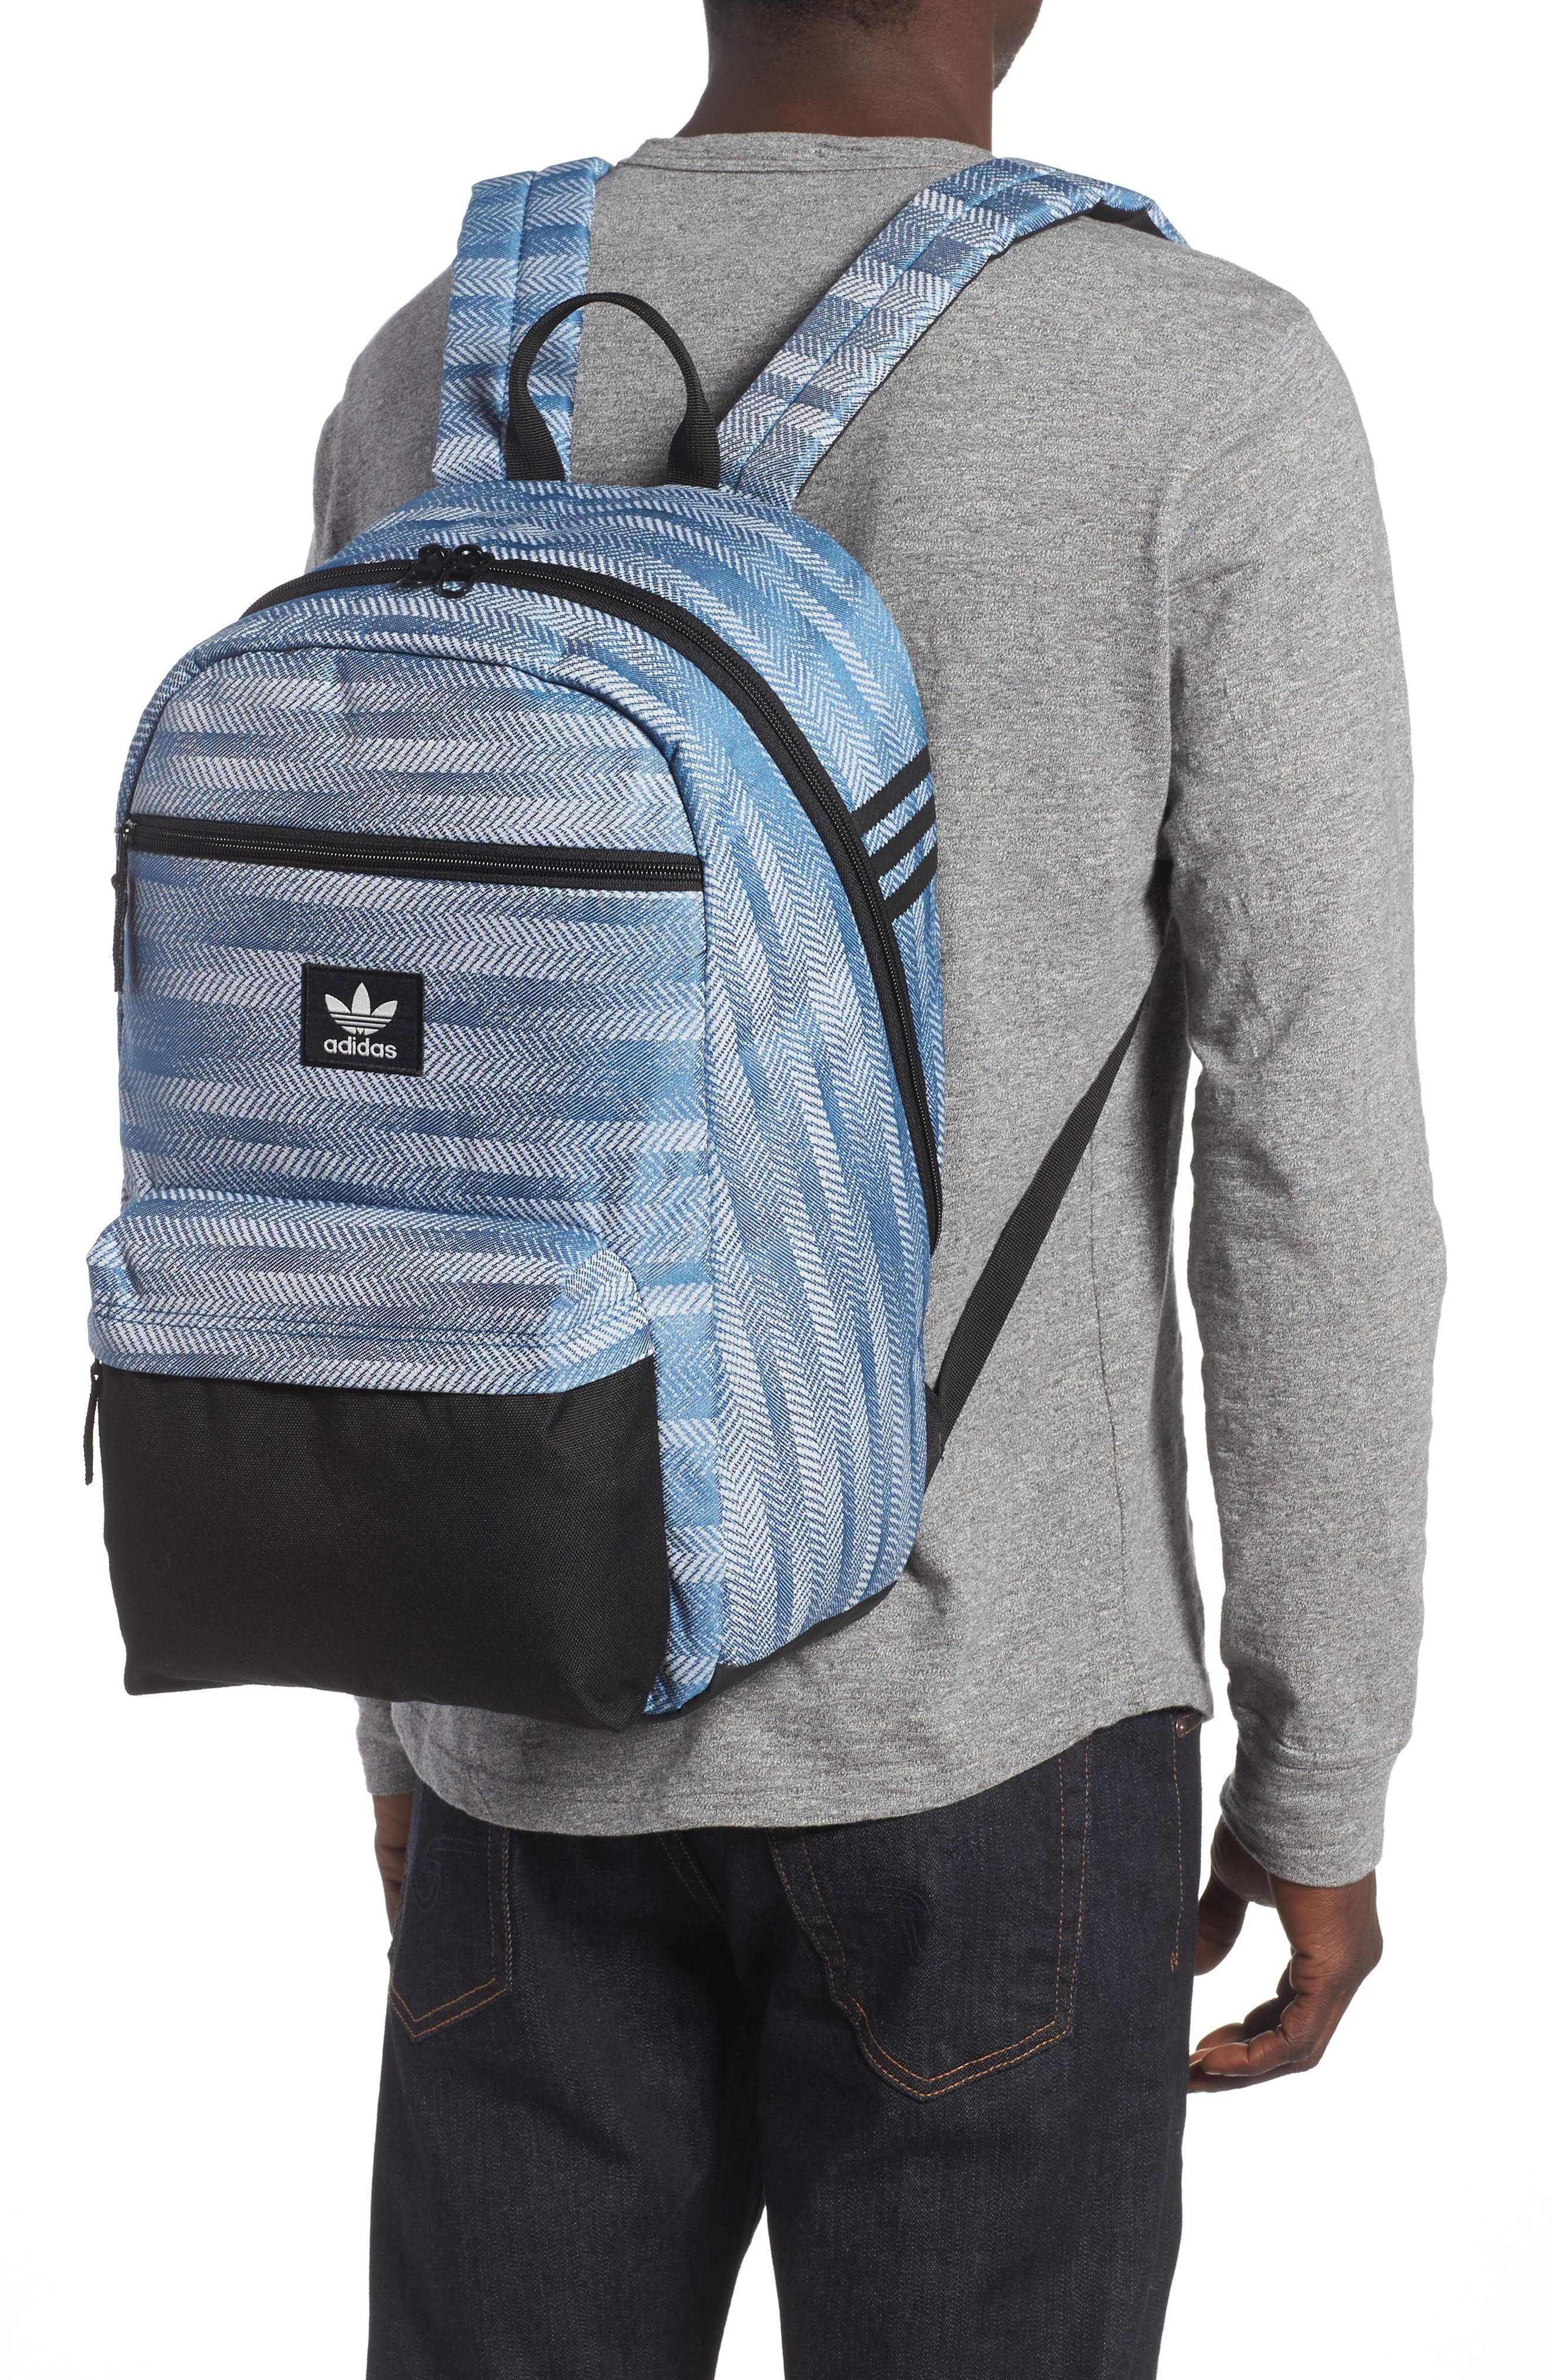 NTL Plus Backpack,                             Alternate thumbnail 2, color,                             CORE BLUE/ BLACK